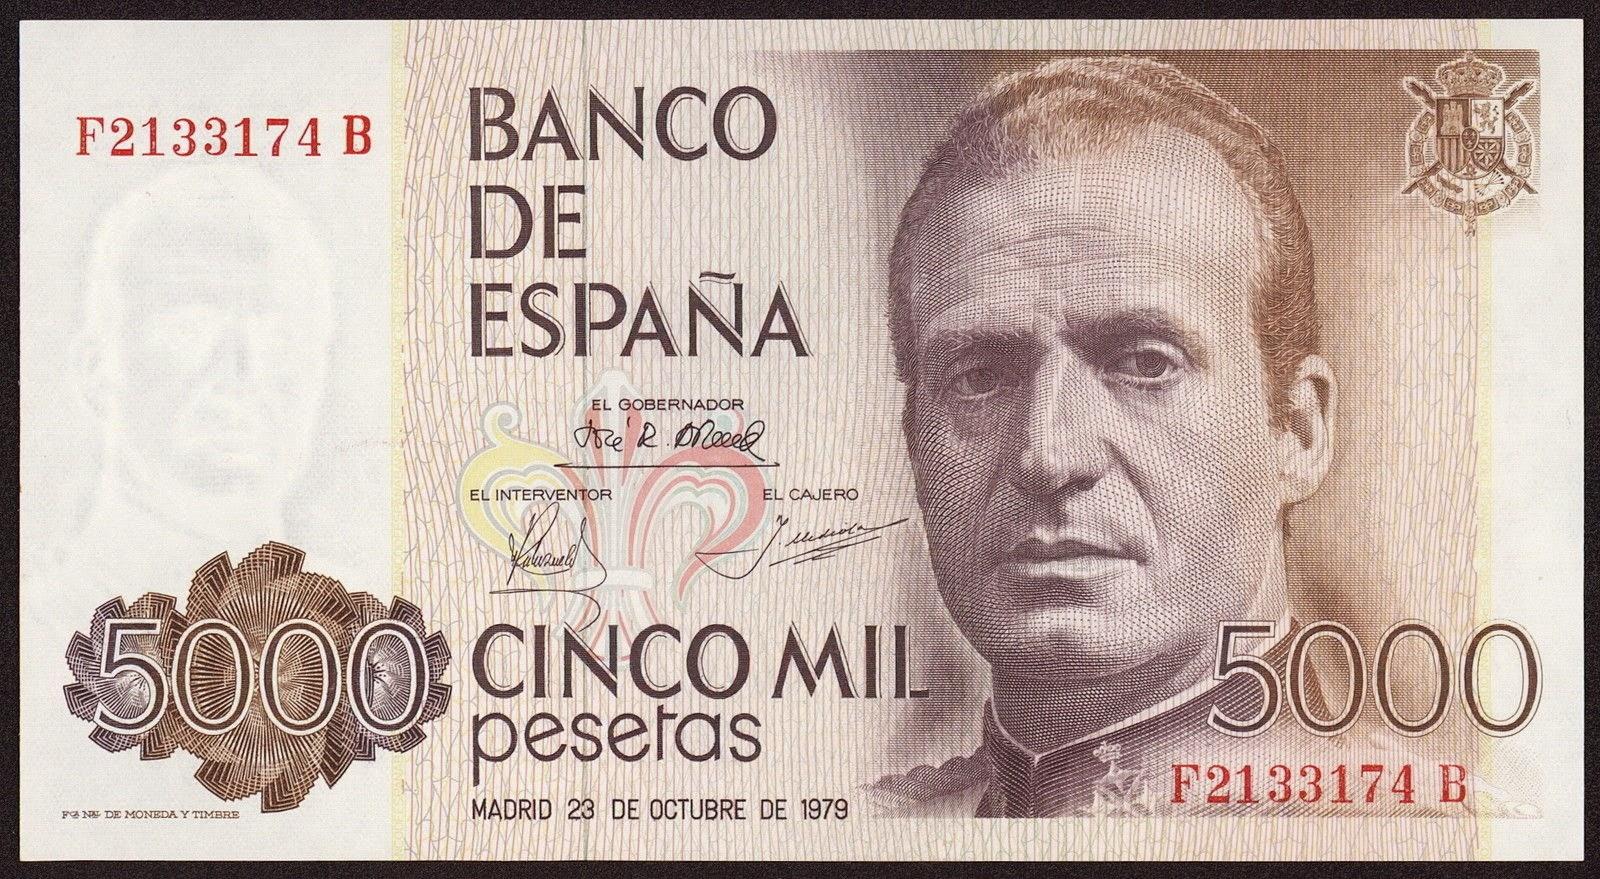 Spain Banknotes 5000 Pesetas banknote 1979 King Juan Carlos I